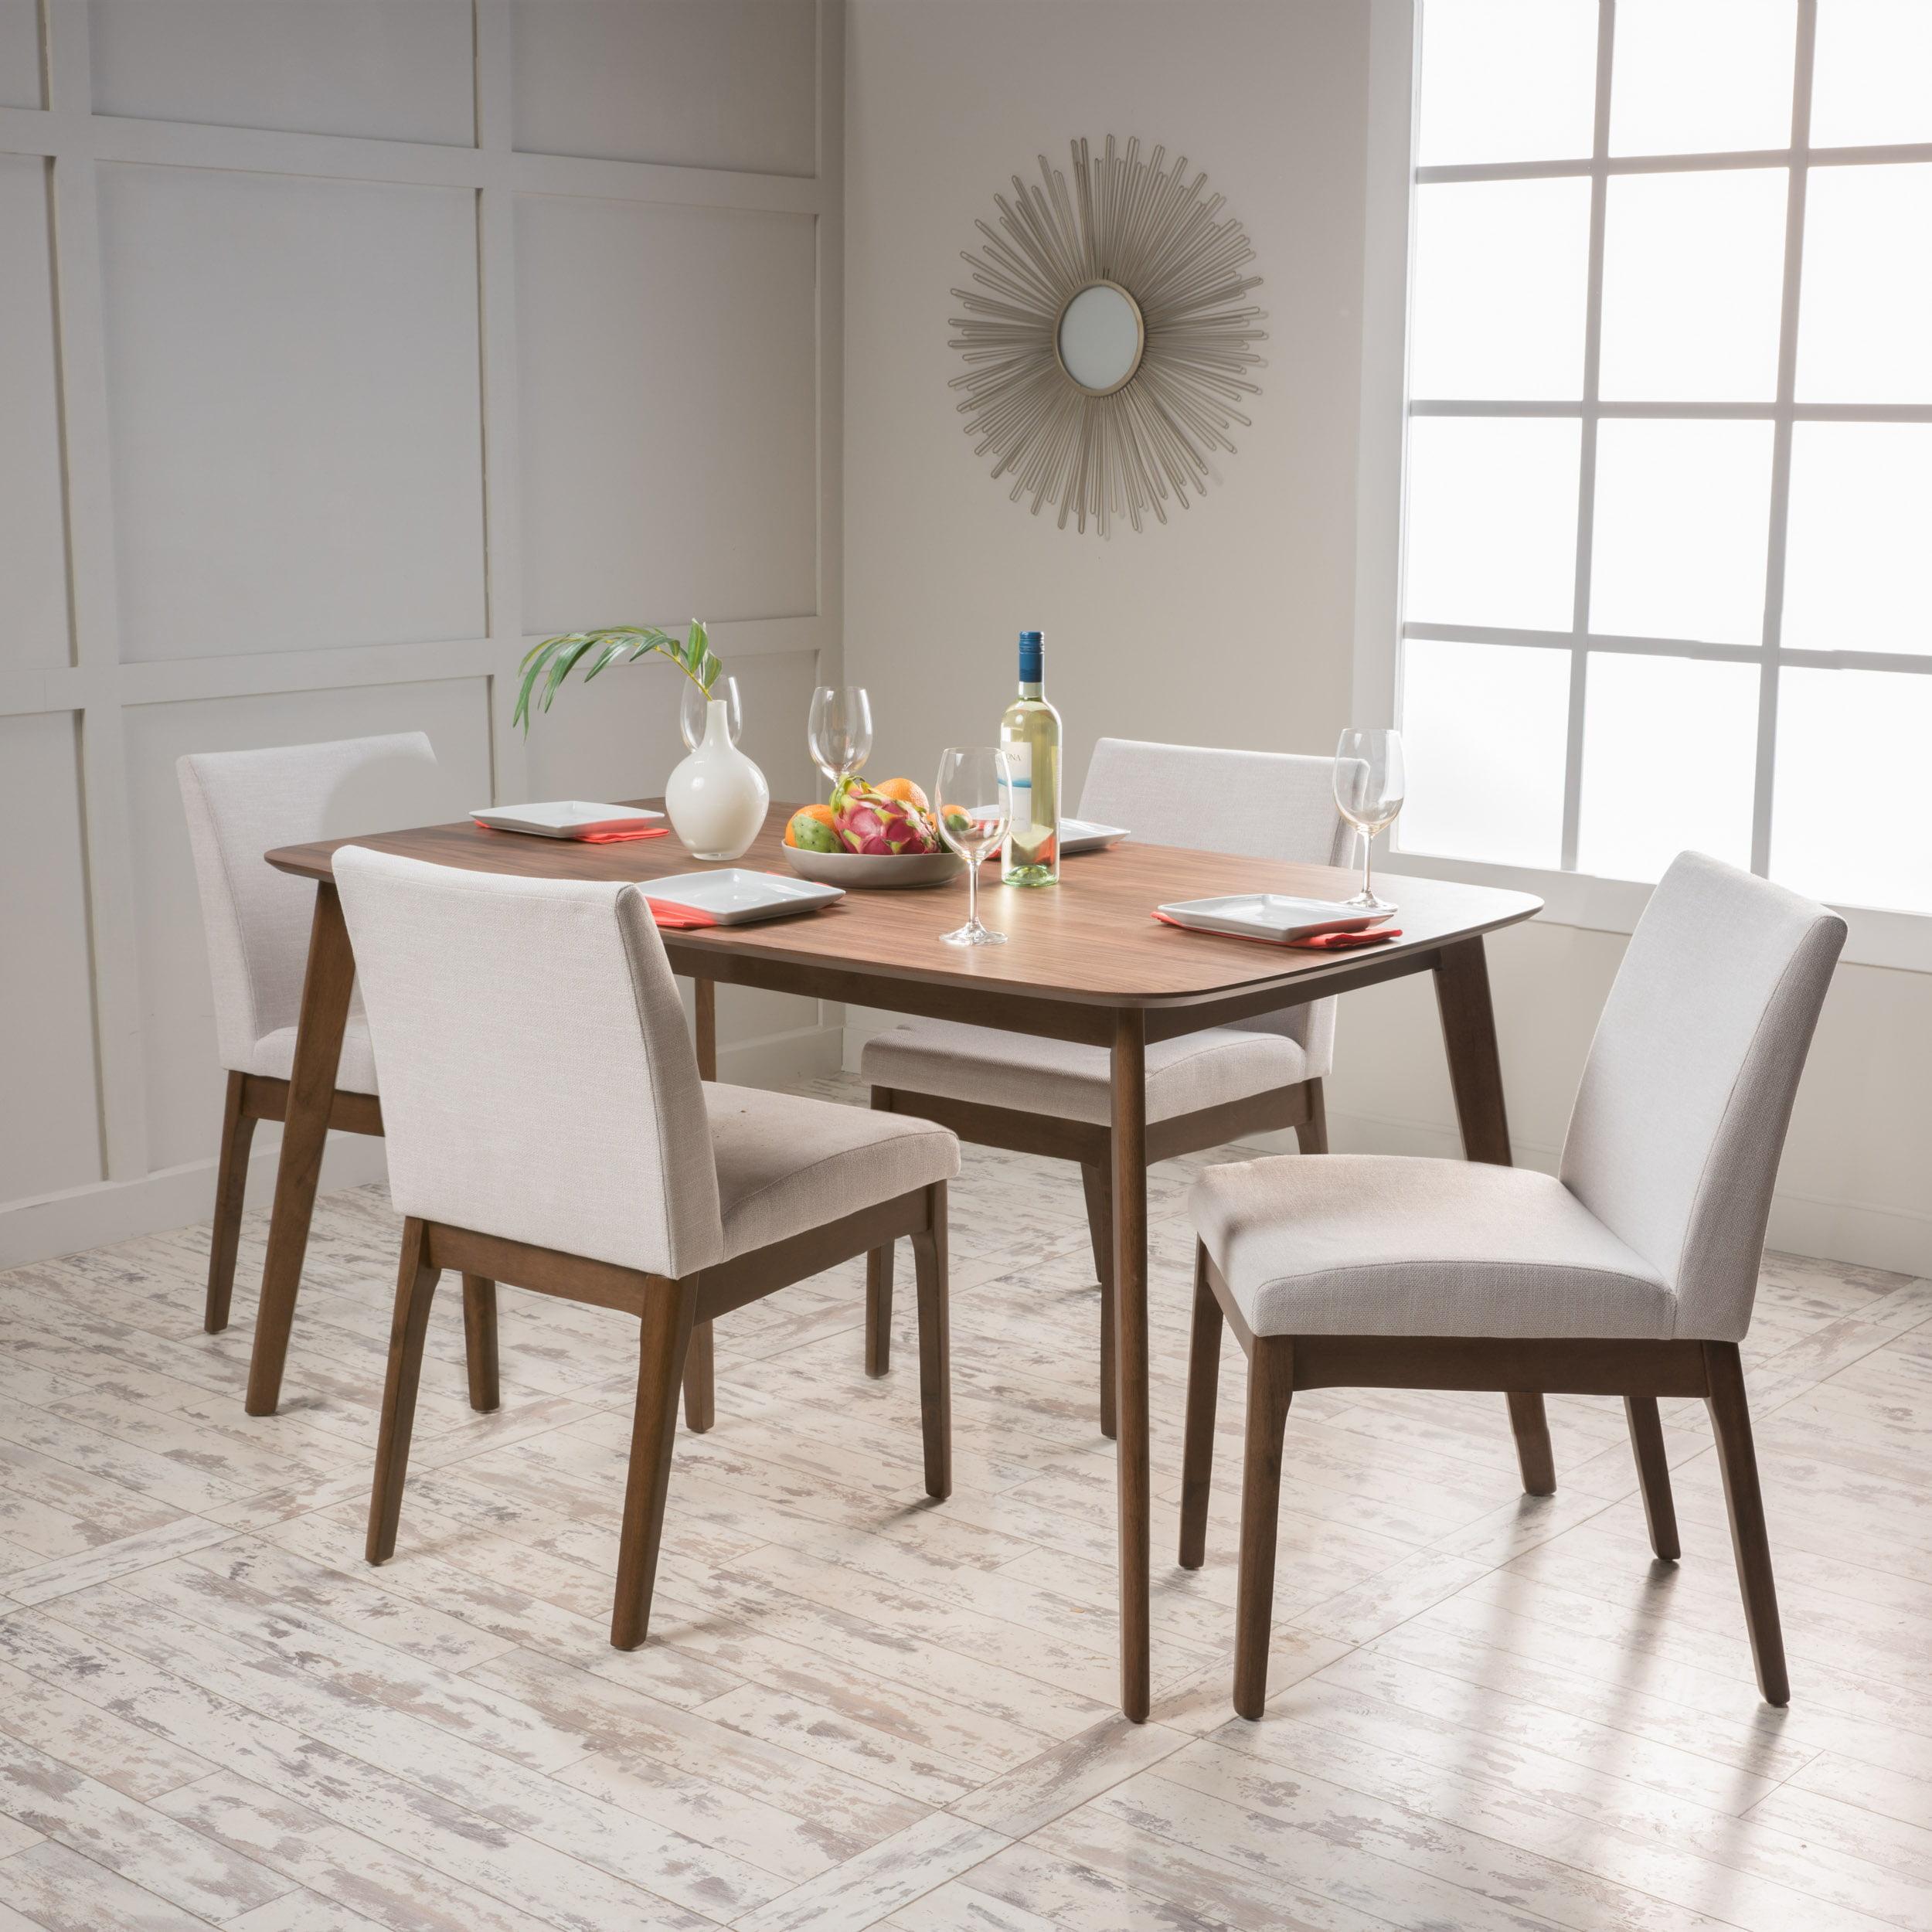 Noble House Caruso 5 Piece Mid-Century Modern Dining Set, Walnut/Light Beige